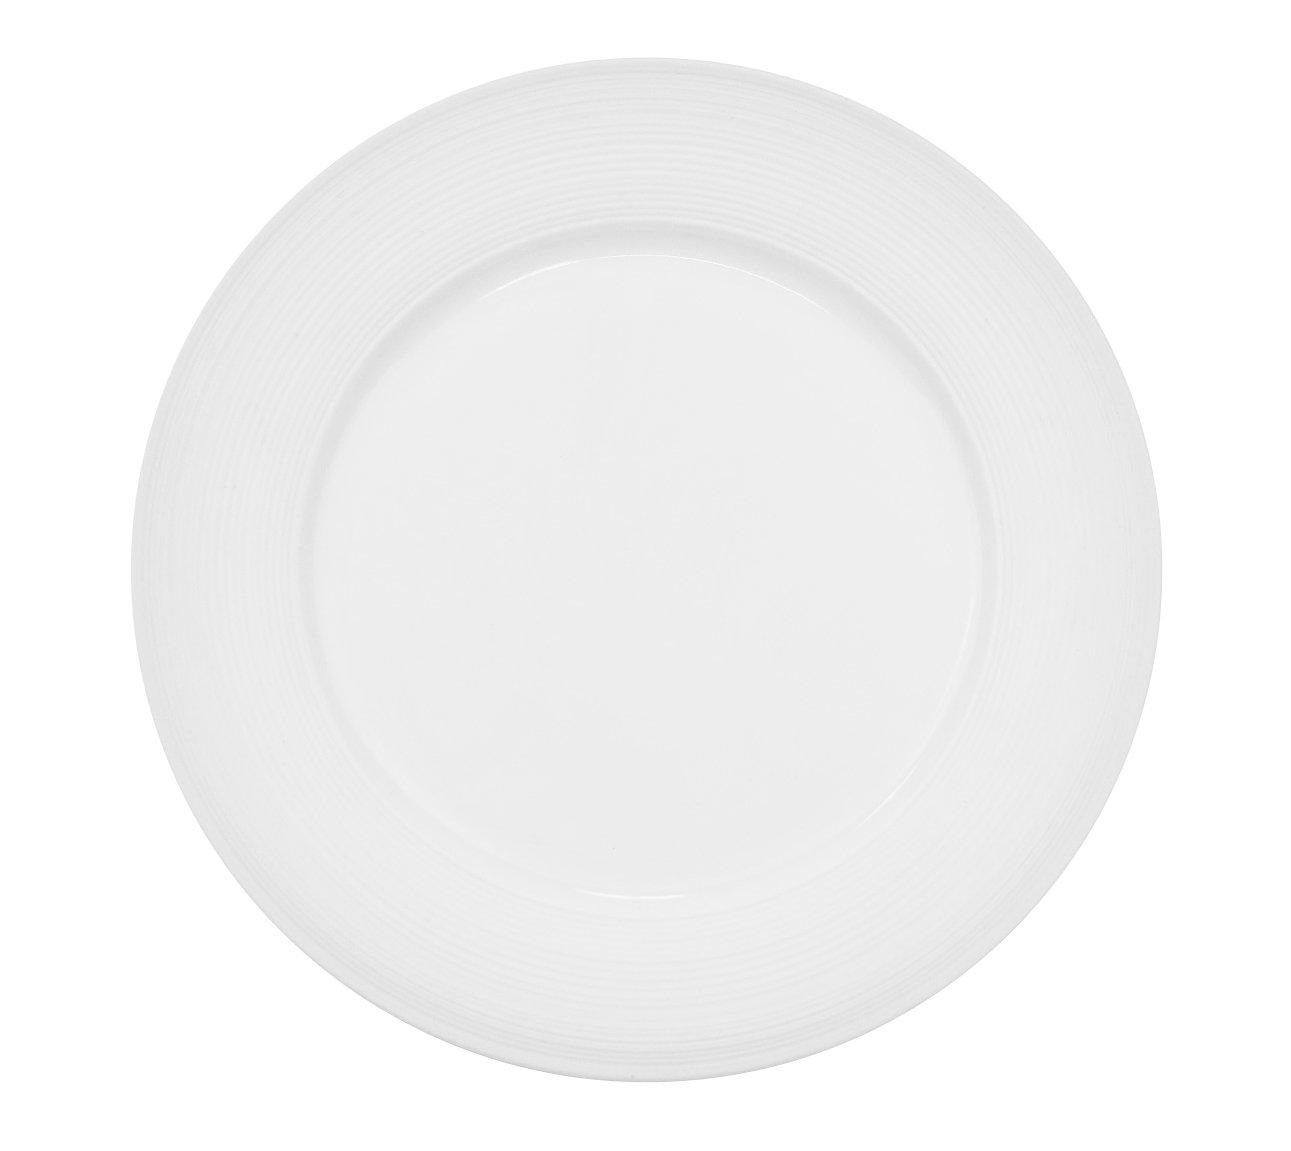 CAC China TST-7 Transitions 7-1/2-Inch Non-Glare Glaze Super White Porcelain Plate, Box of 36